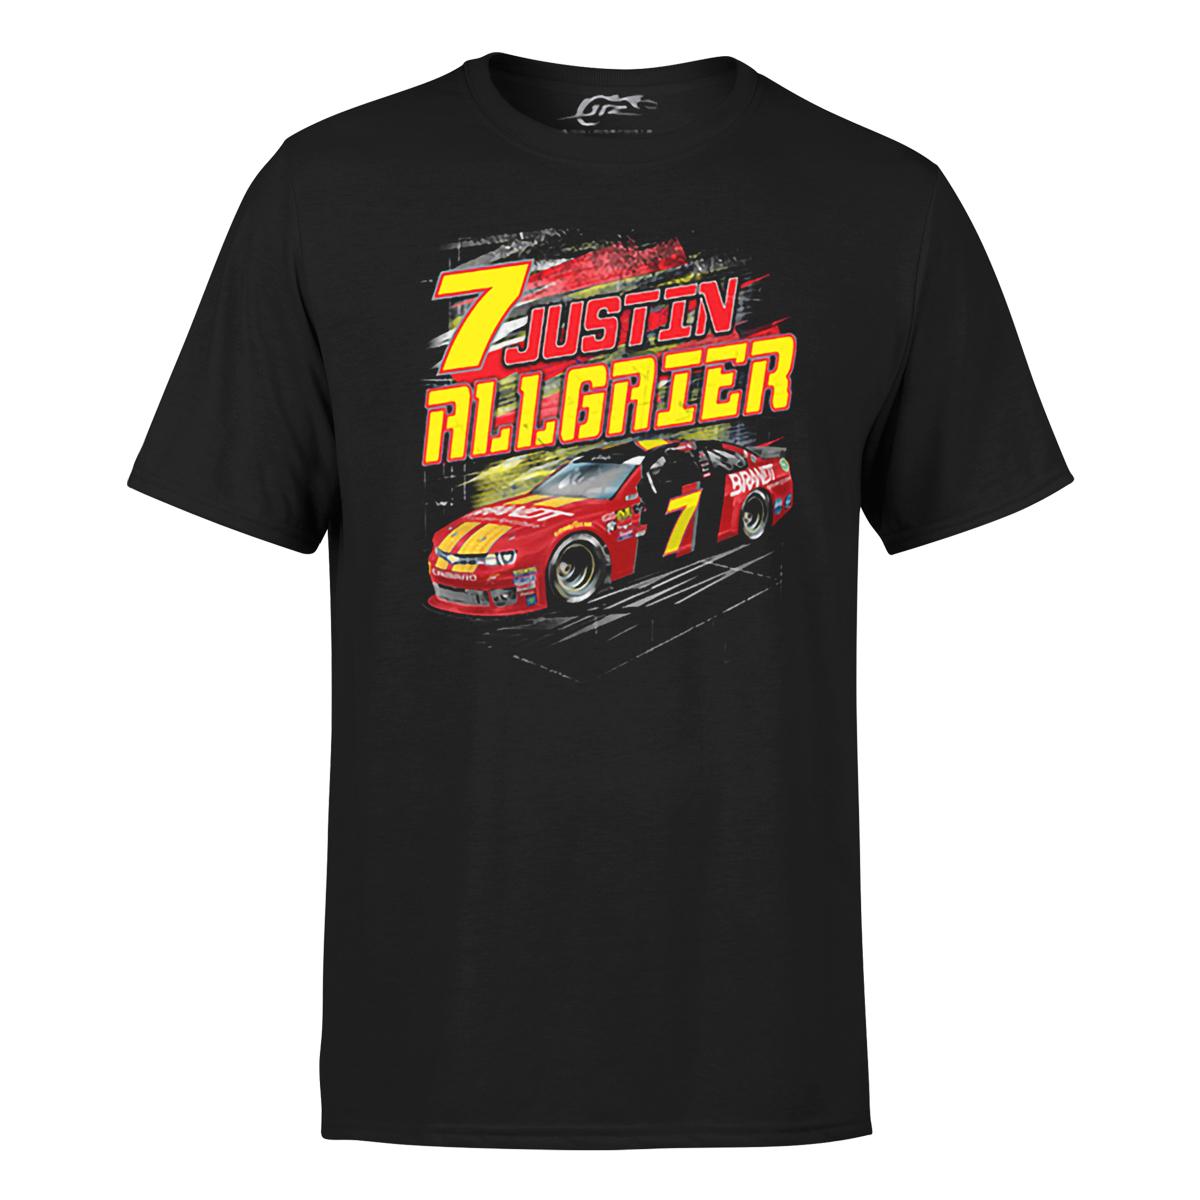 Justin Allgaier 2018 Xfinity #7 Torque T-shirt